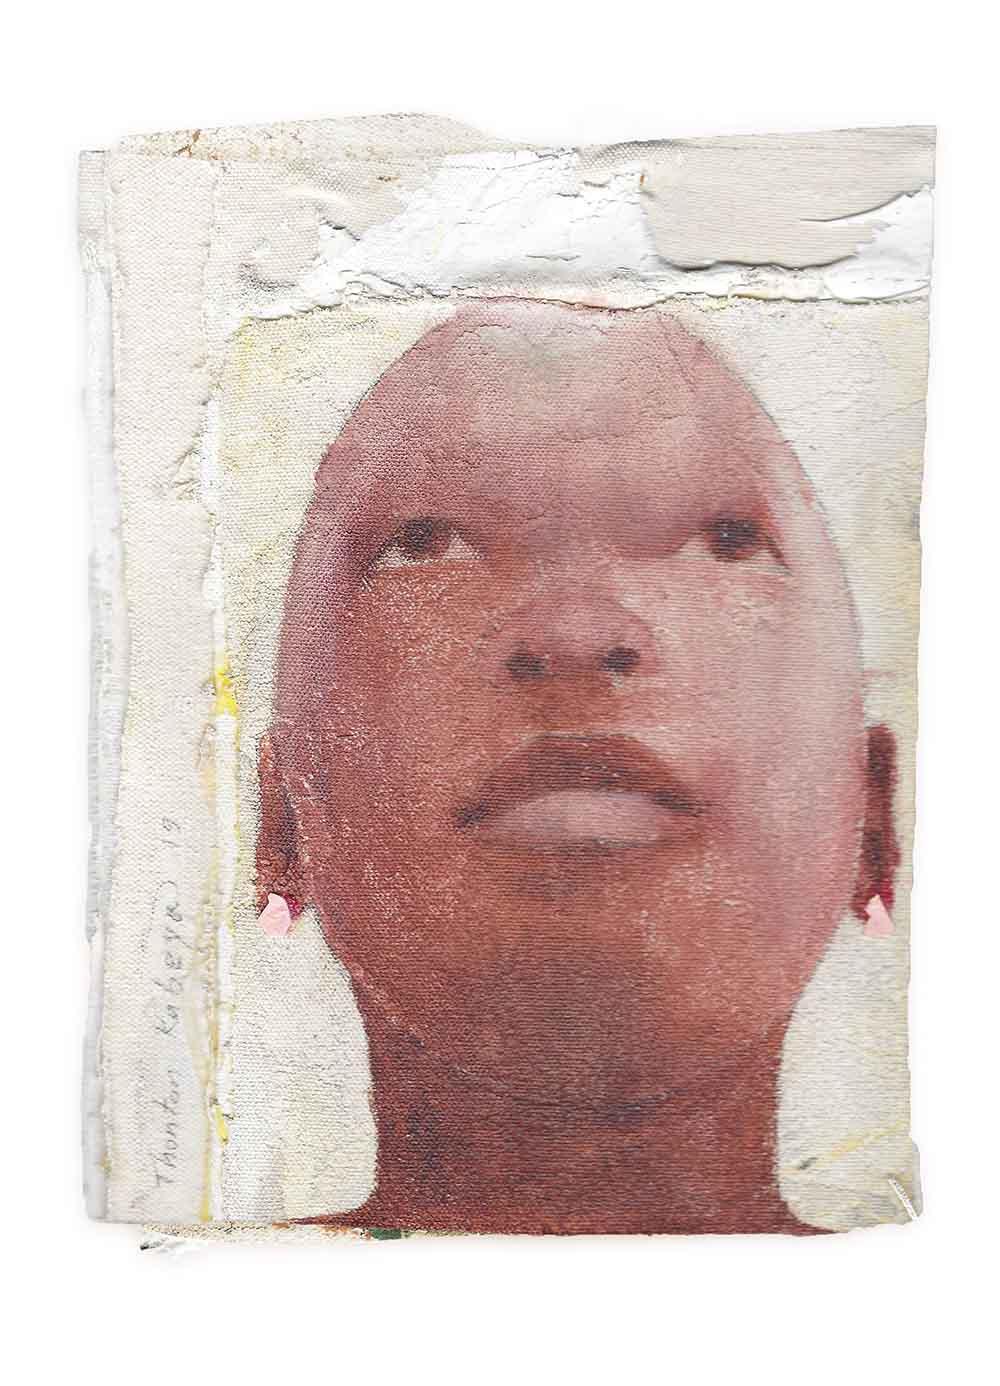 La Rumba (series) 2019 walnut powder and newspaper Ink transfer on Canvas approx. 24 x 16 cm (each)